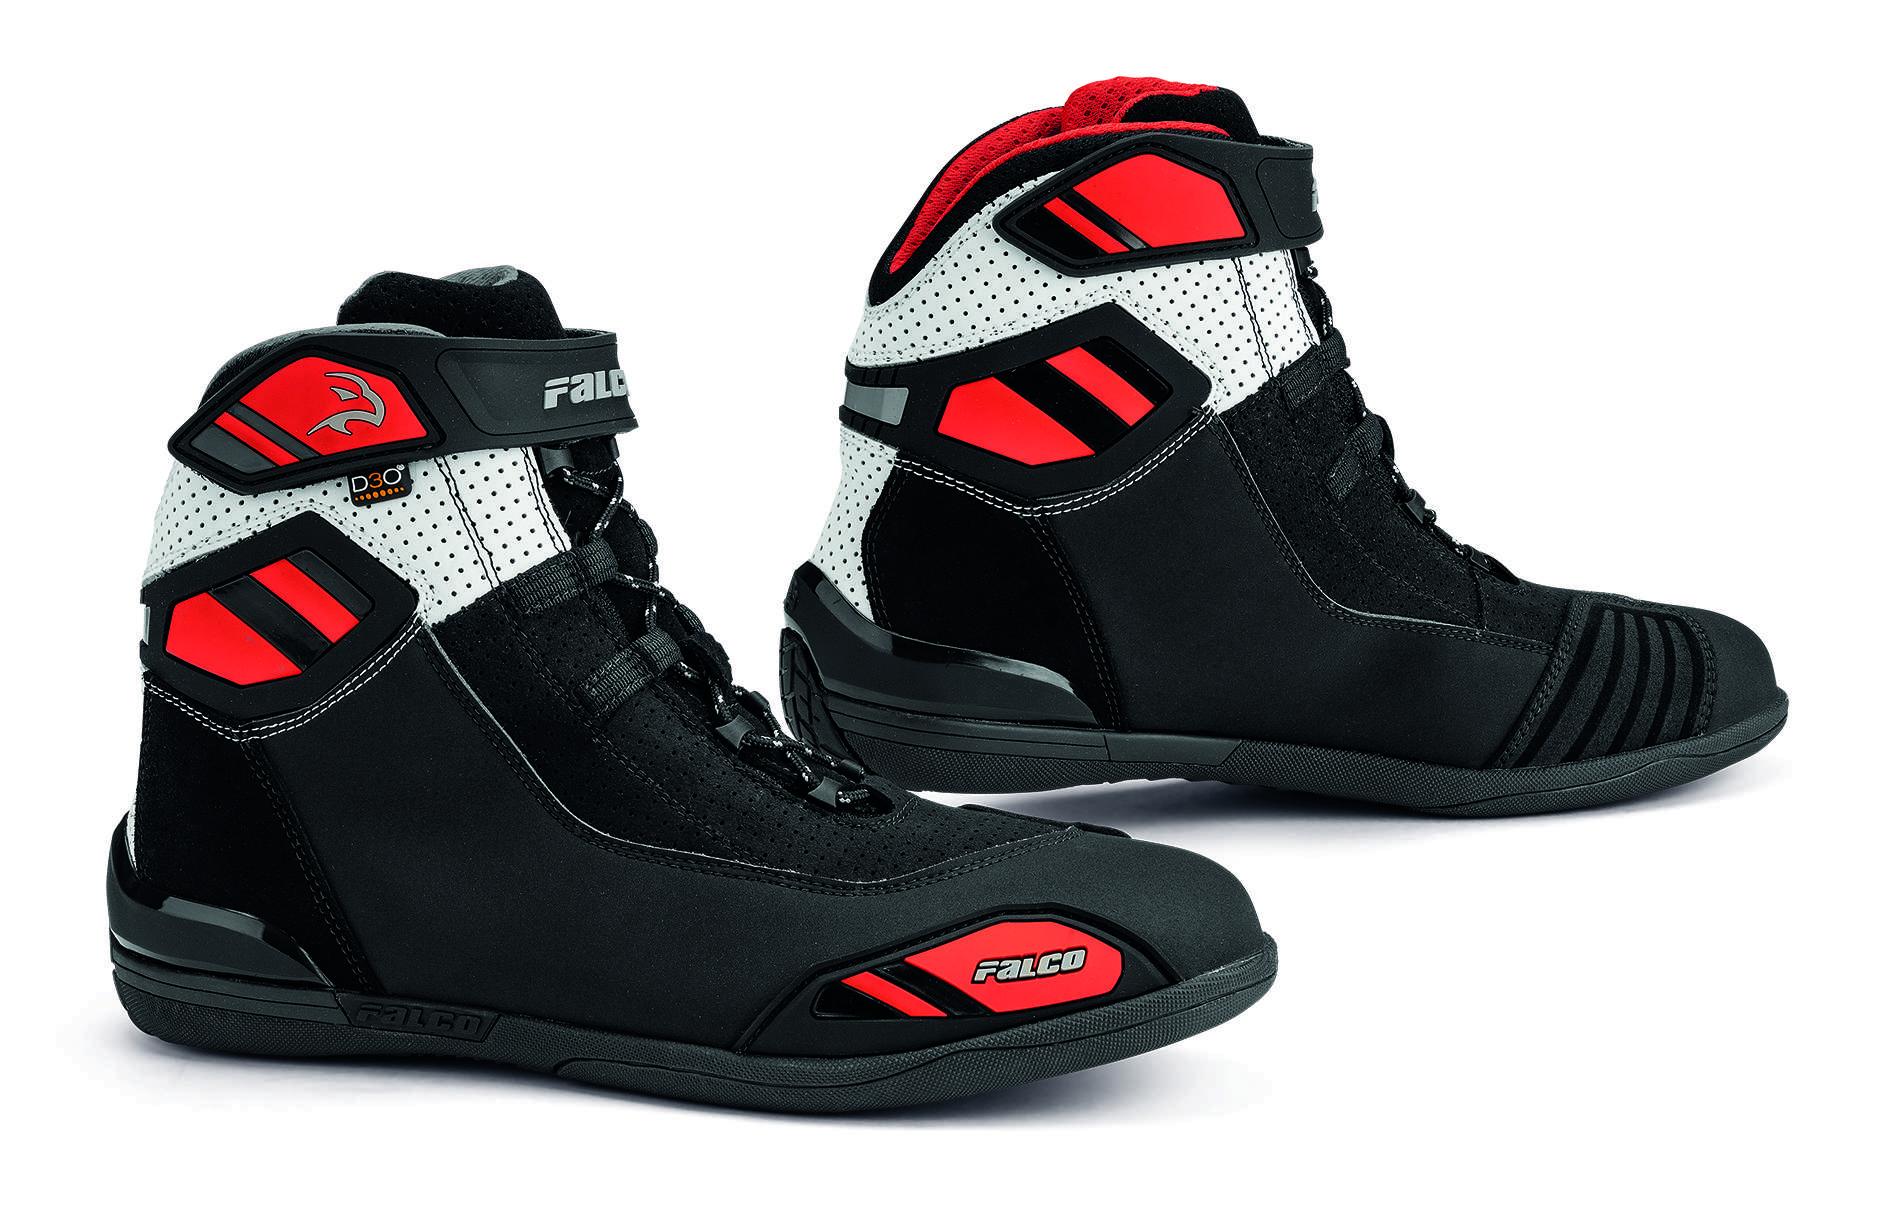 906_jackal-2-air_black-white-red